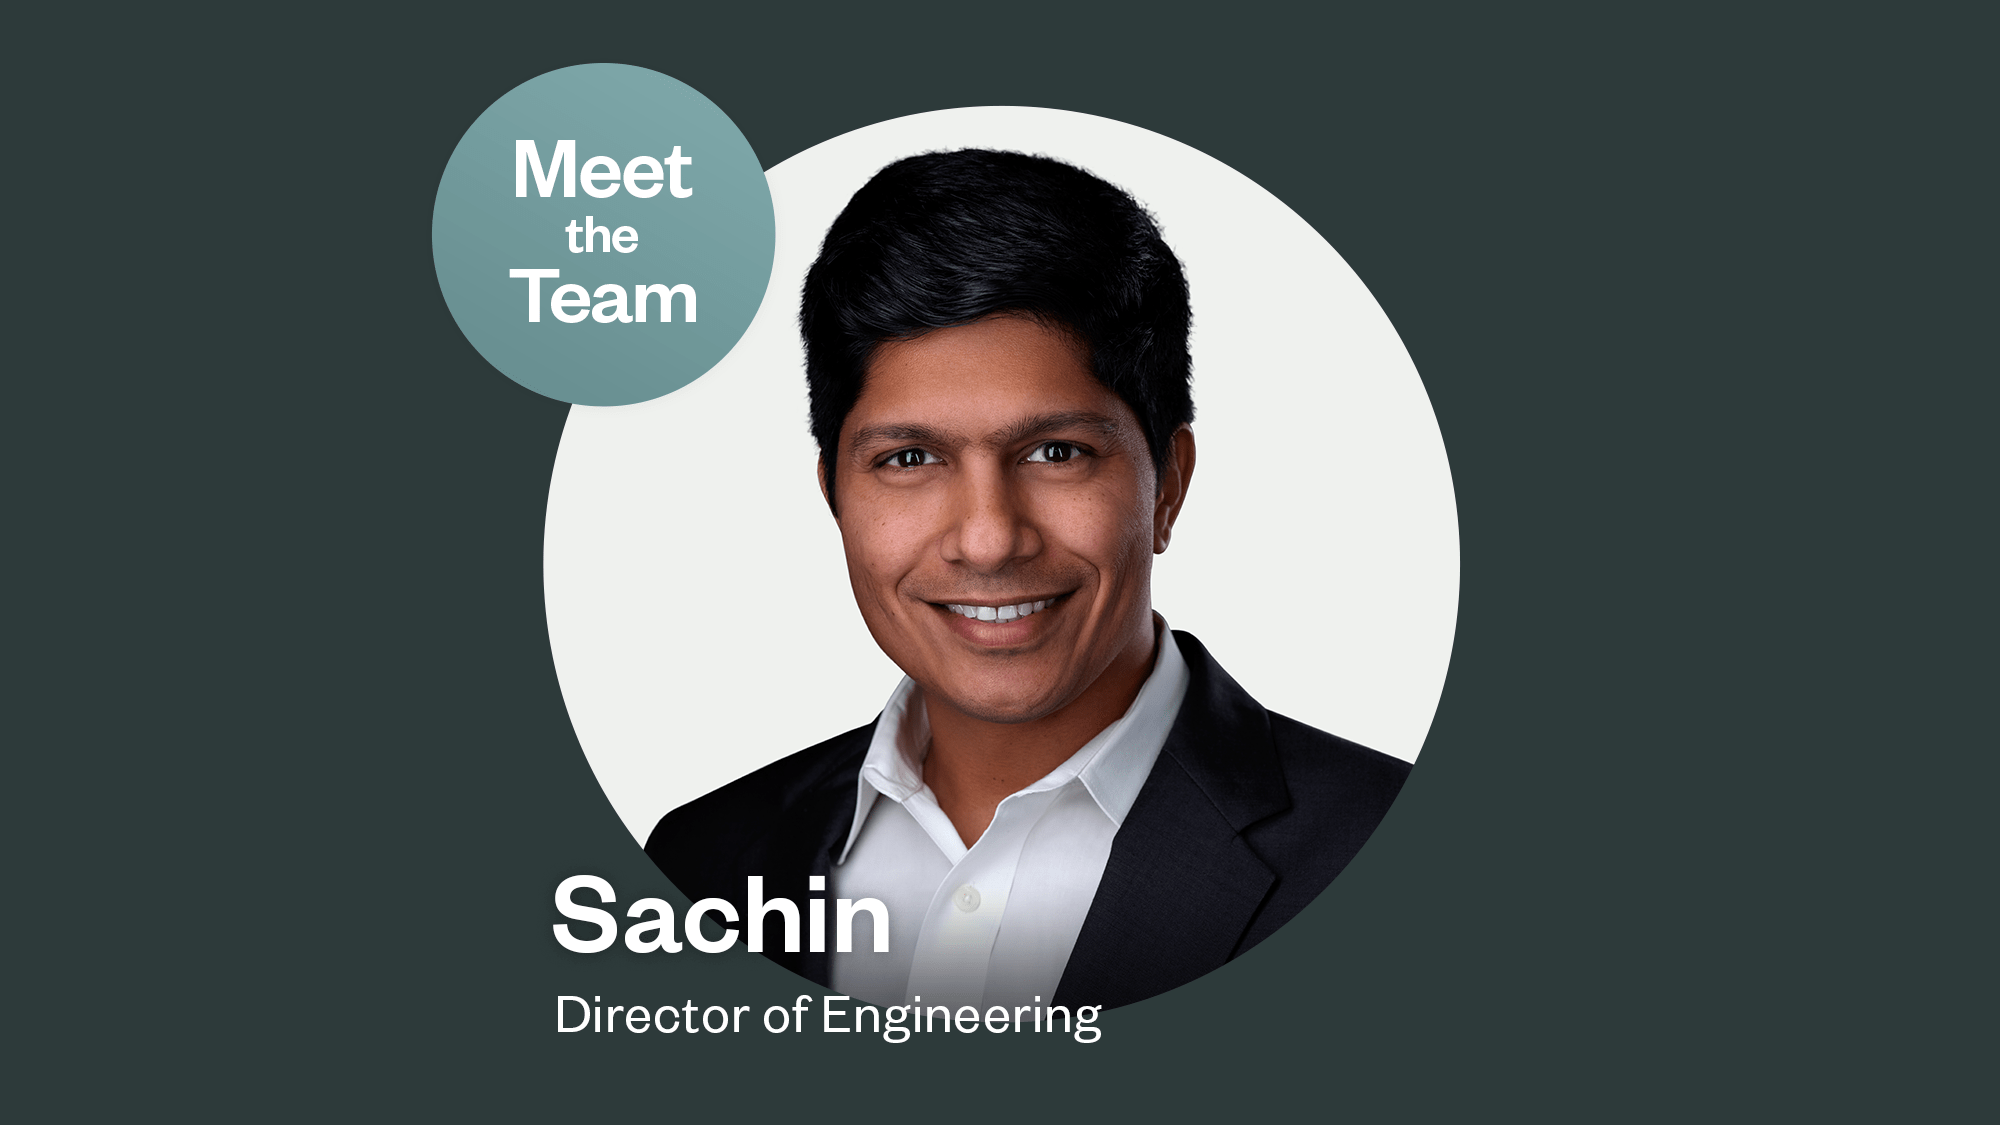 Photo of director of engineering Sachin Kulkarni, lead of securing users' personal data.